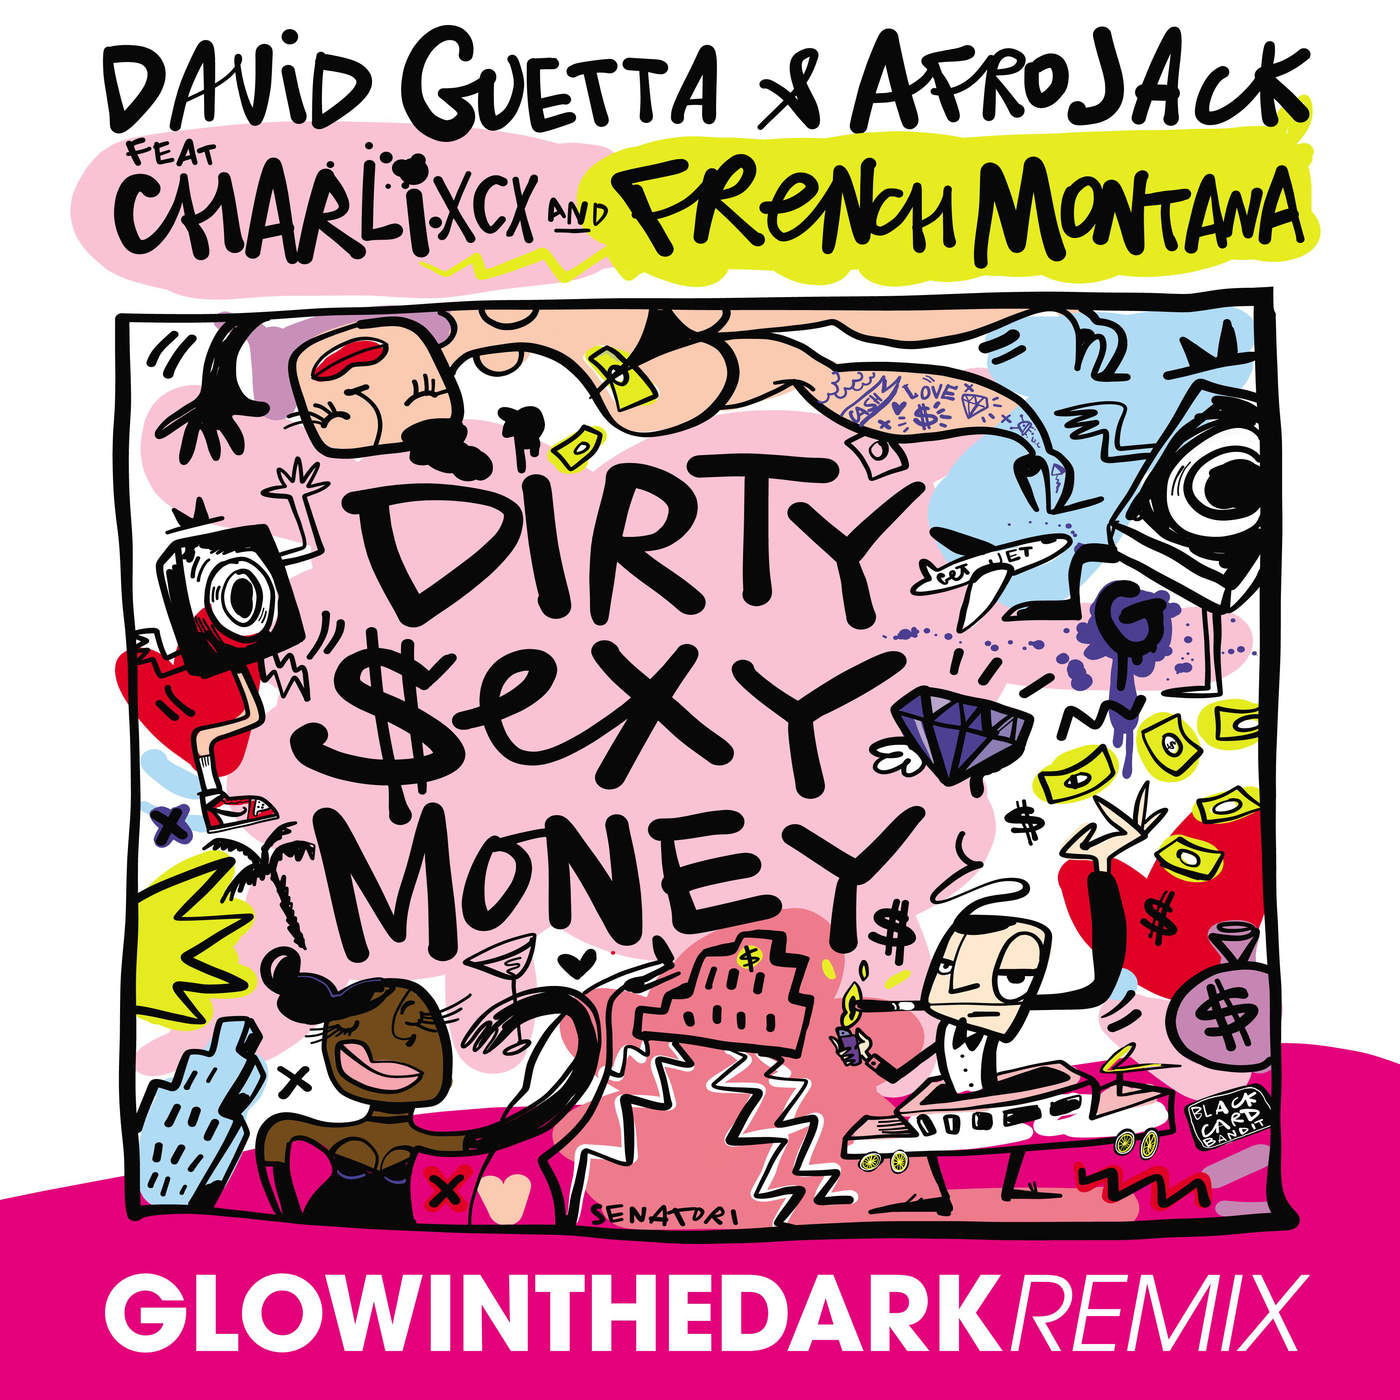 David Guetta & Afrojack - Dirty Sexy Money (feat. Charli XCX & French Montana) [GLOWINTHEDARK Remix] - Single Cover